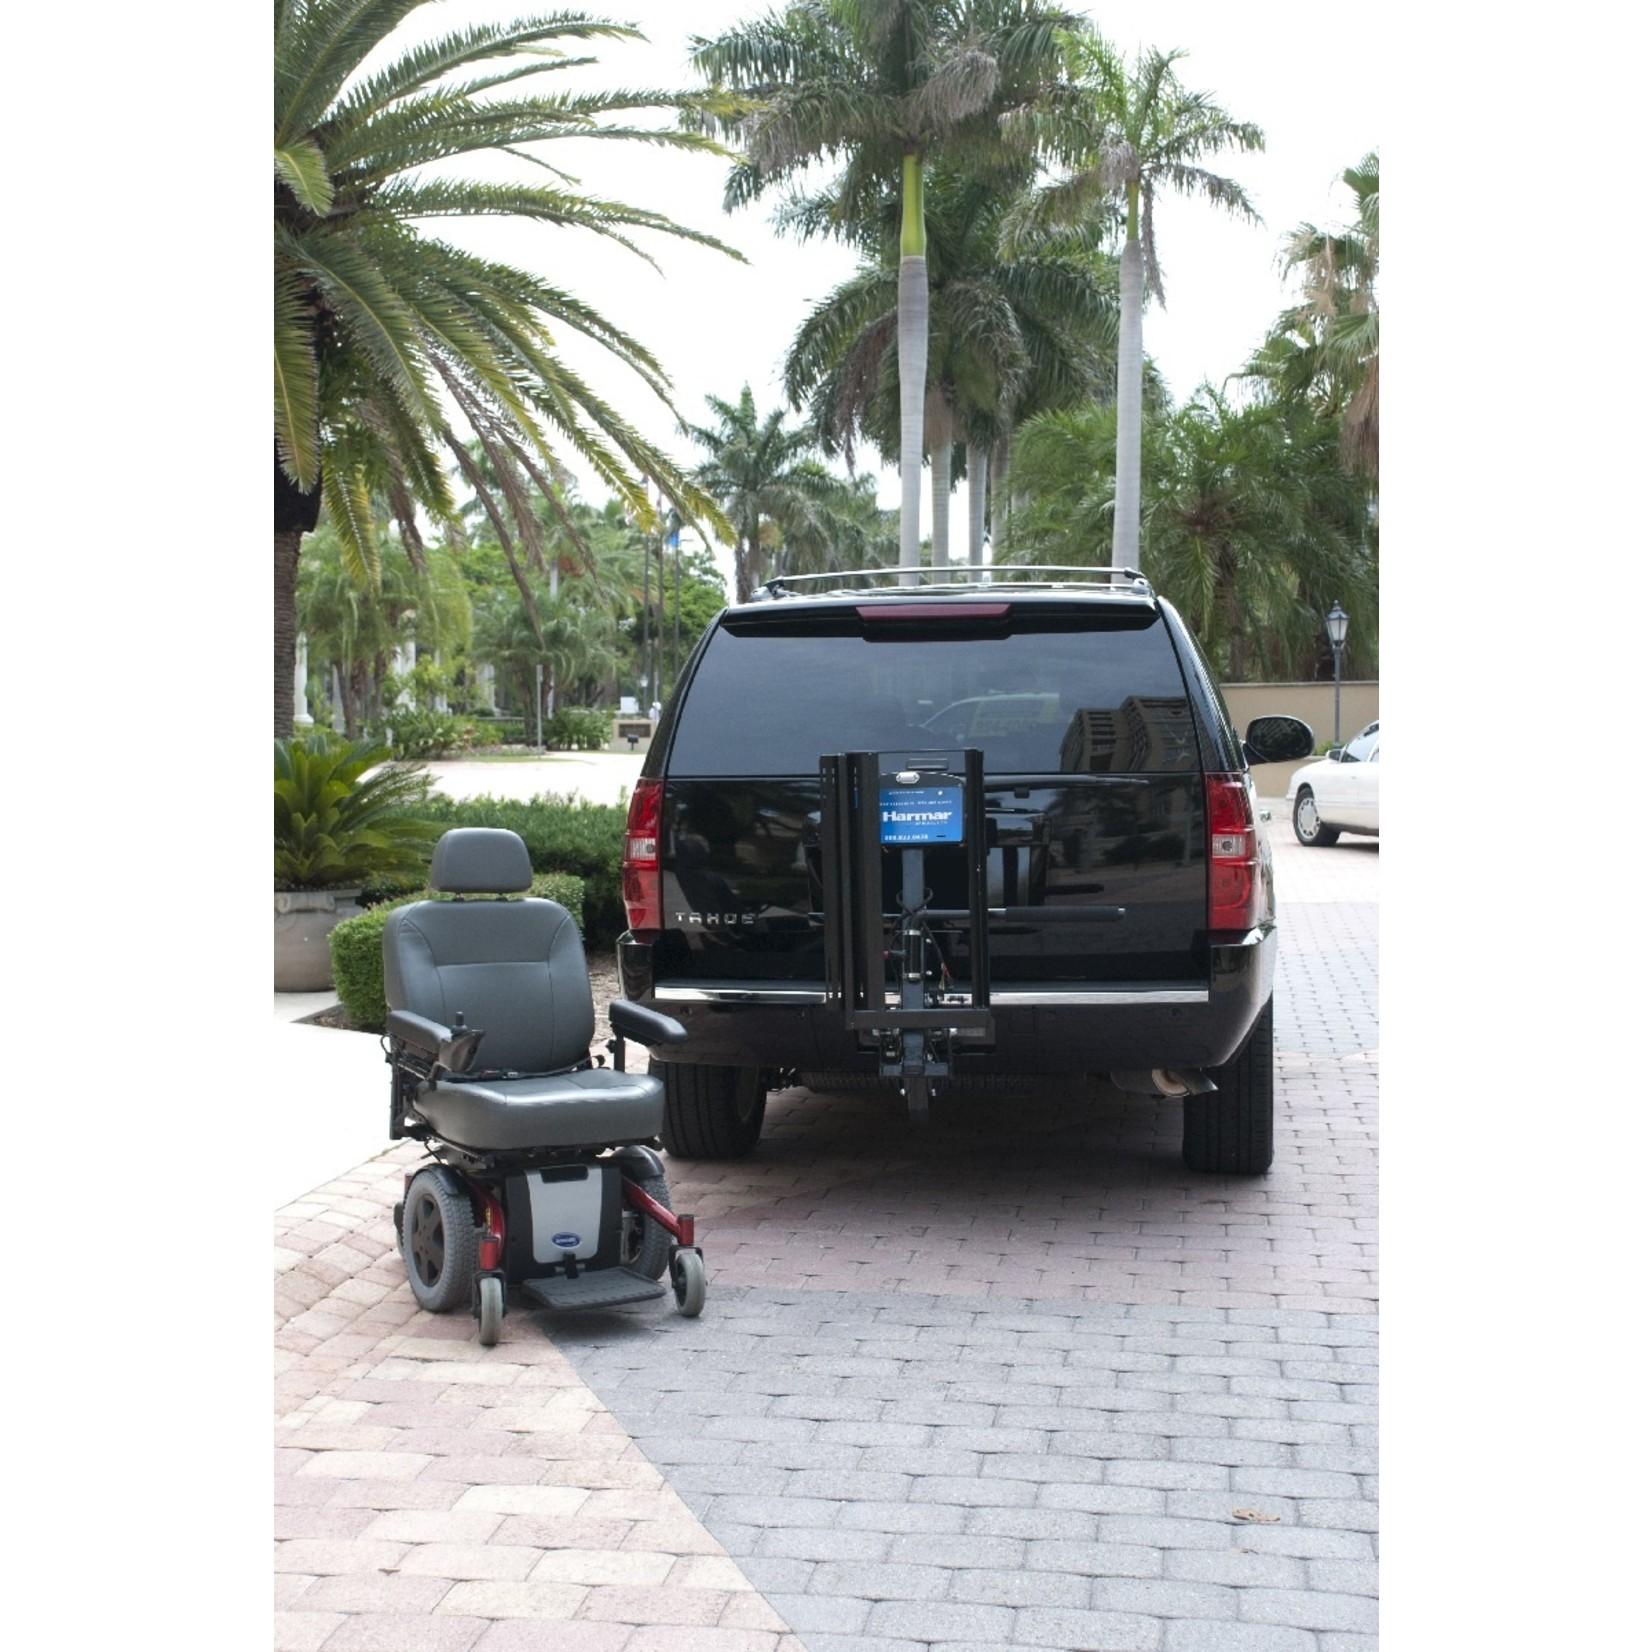 Harmar Mobility AL580XL Extra Large Profile MWD Power Wheelchair Lift